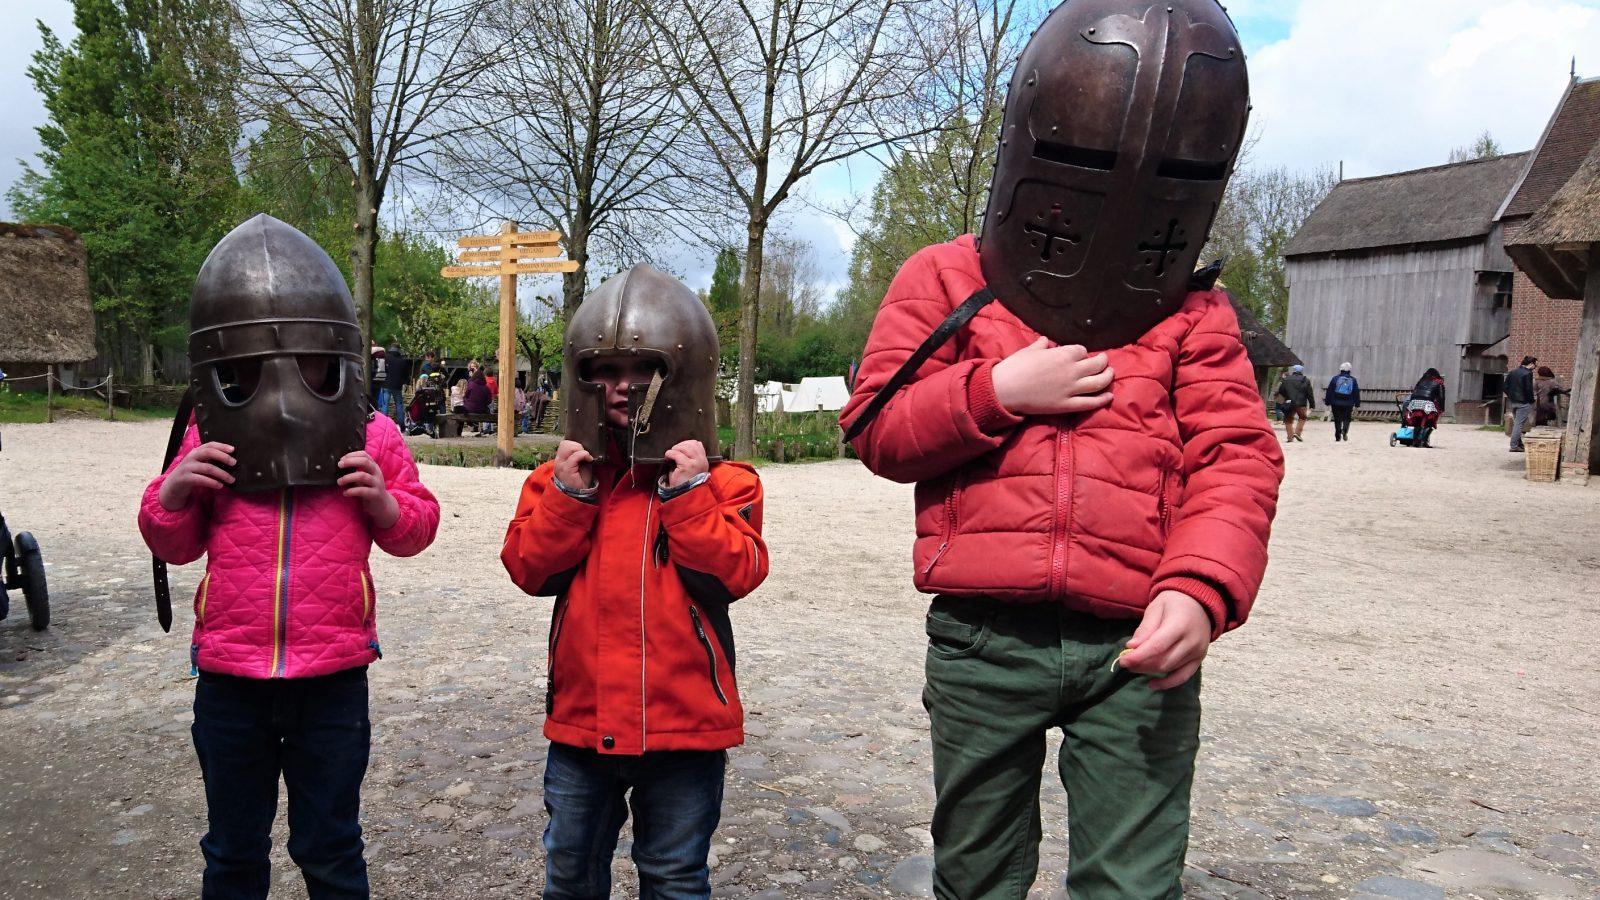 Archeon ridders